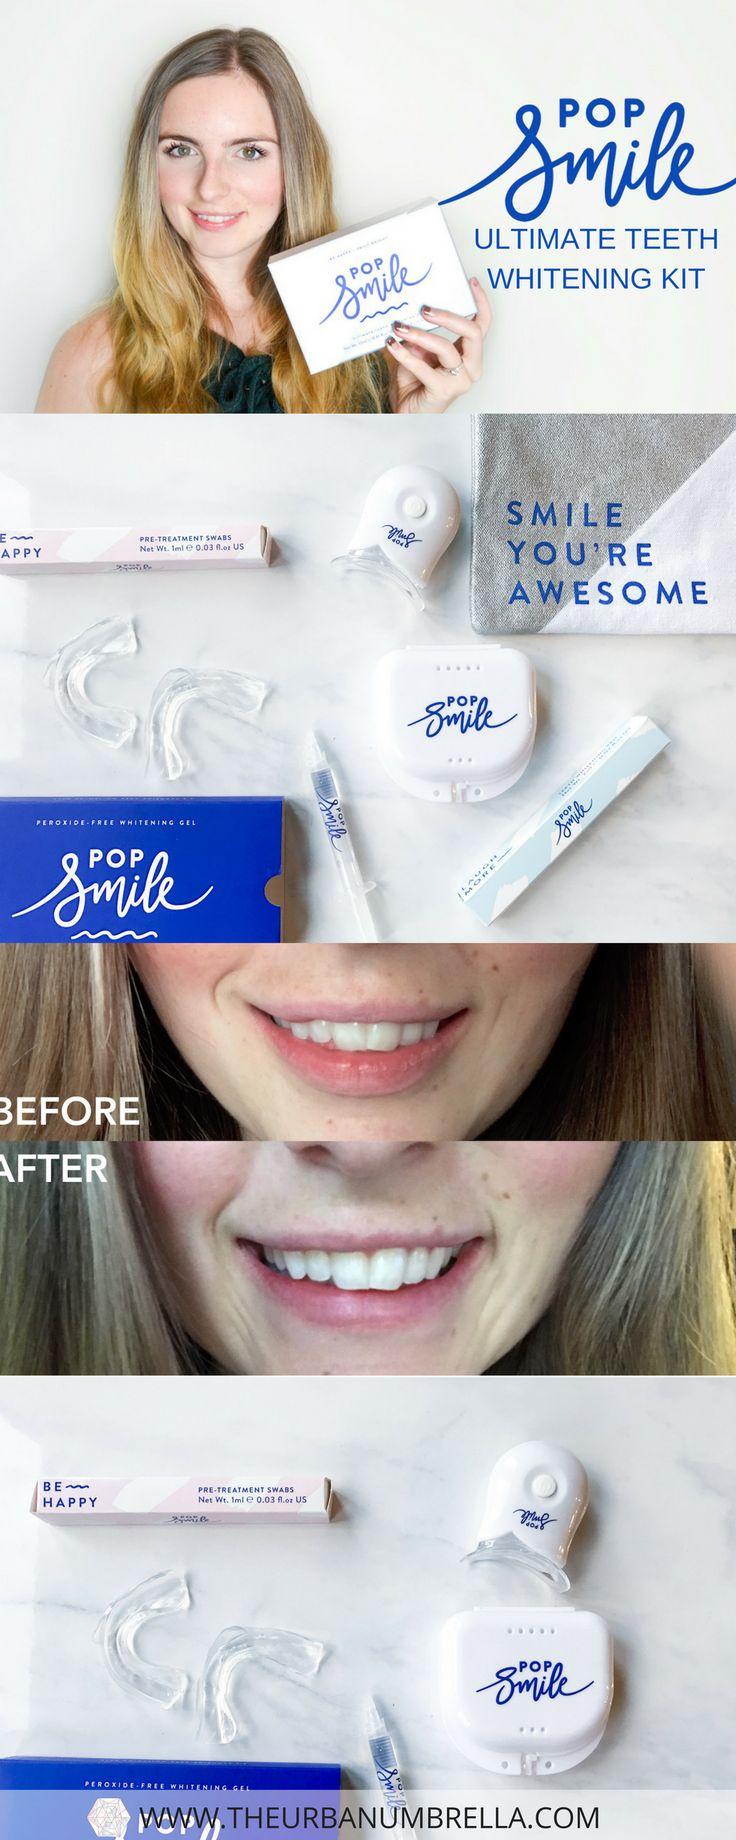 Whitening my Teeth with Pop Smile's Ultimate Teeth Whitening Kit